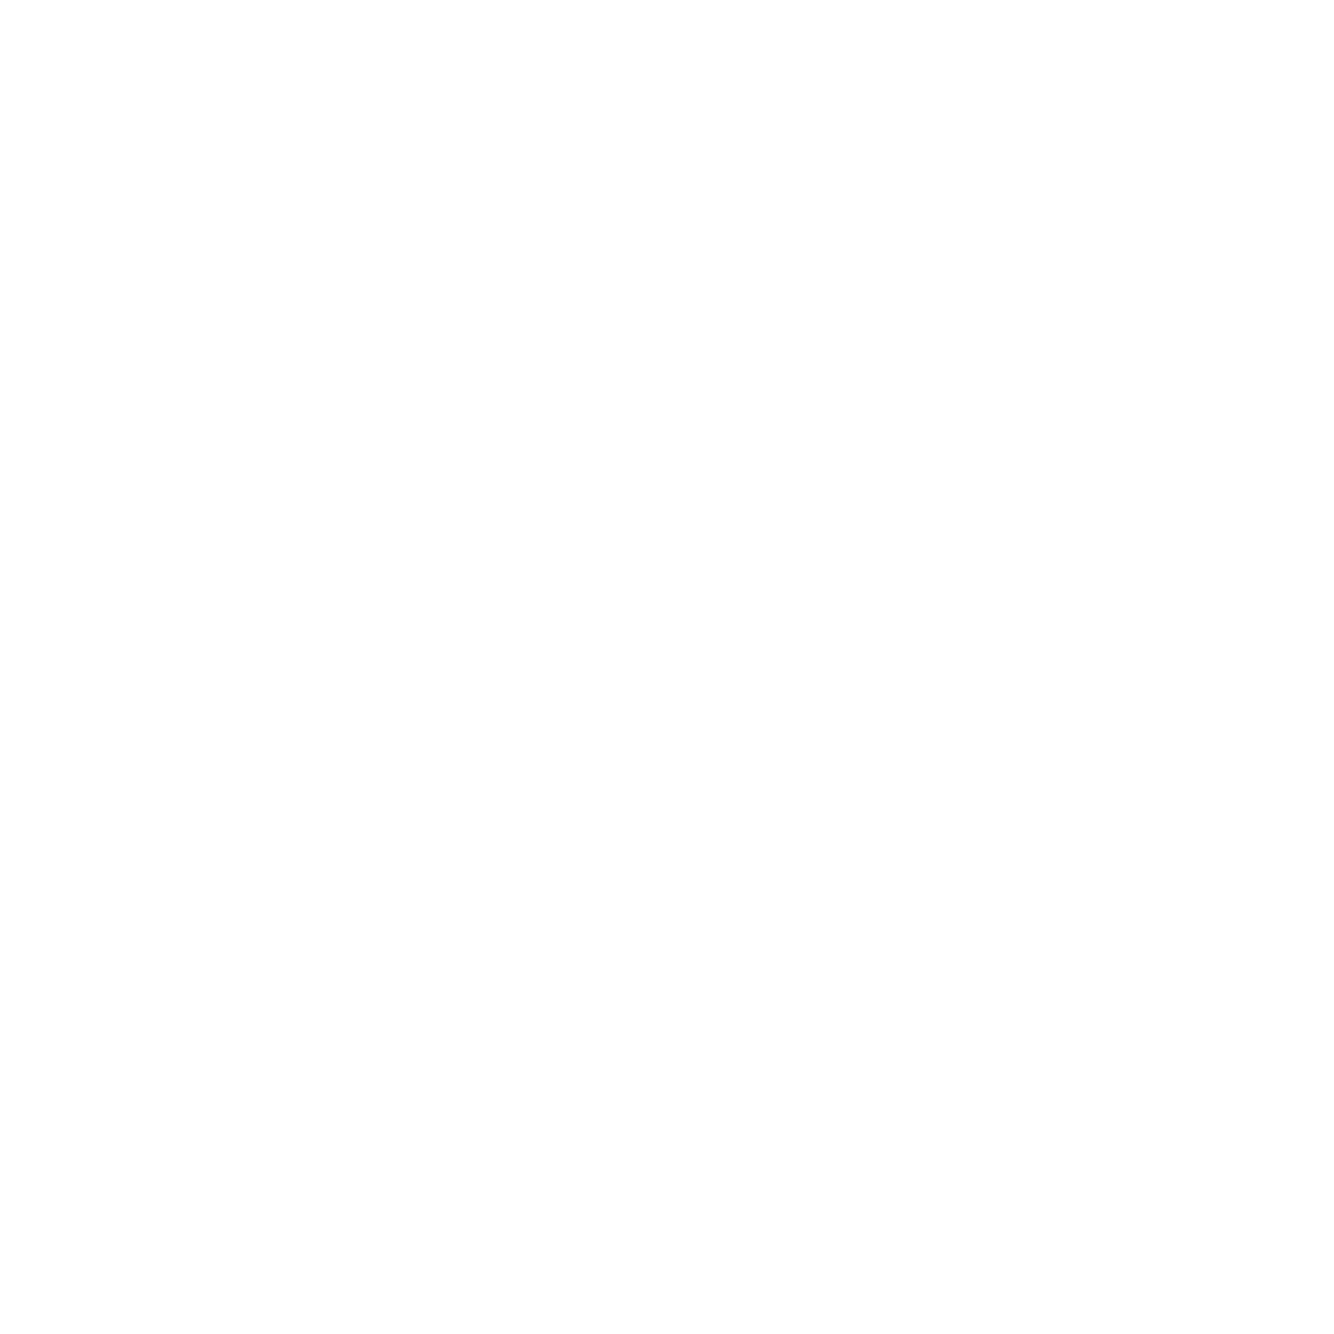 Crunchy Carrots Web Design, Social Media, Photography and Video Falkirk, Edinburgh and Glasgow